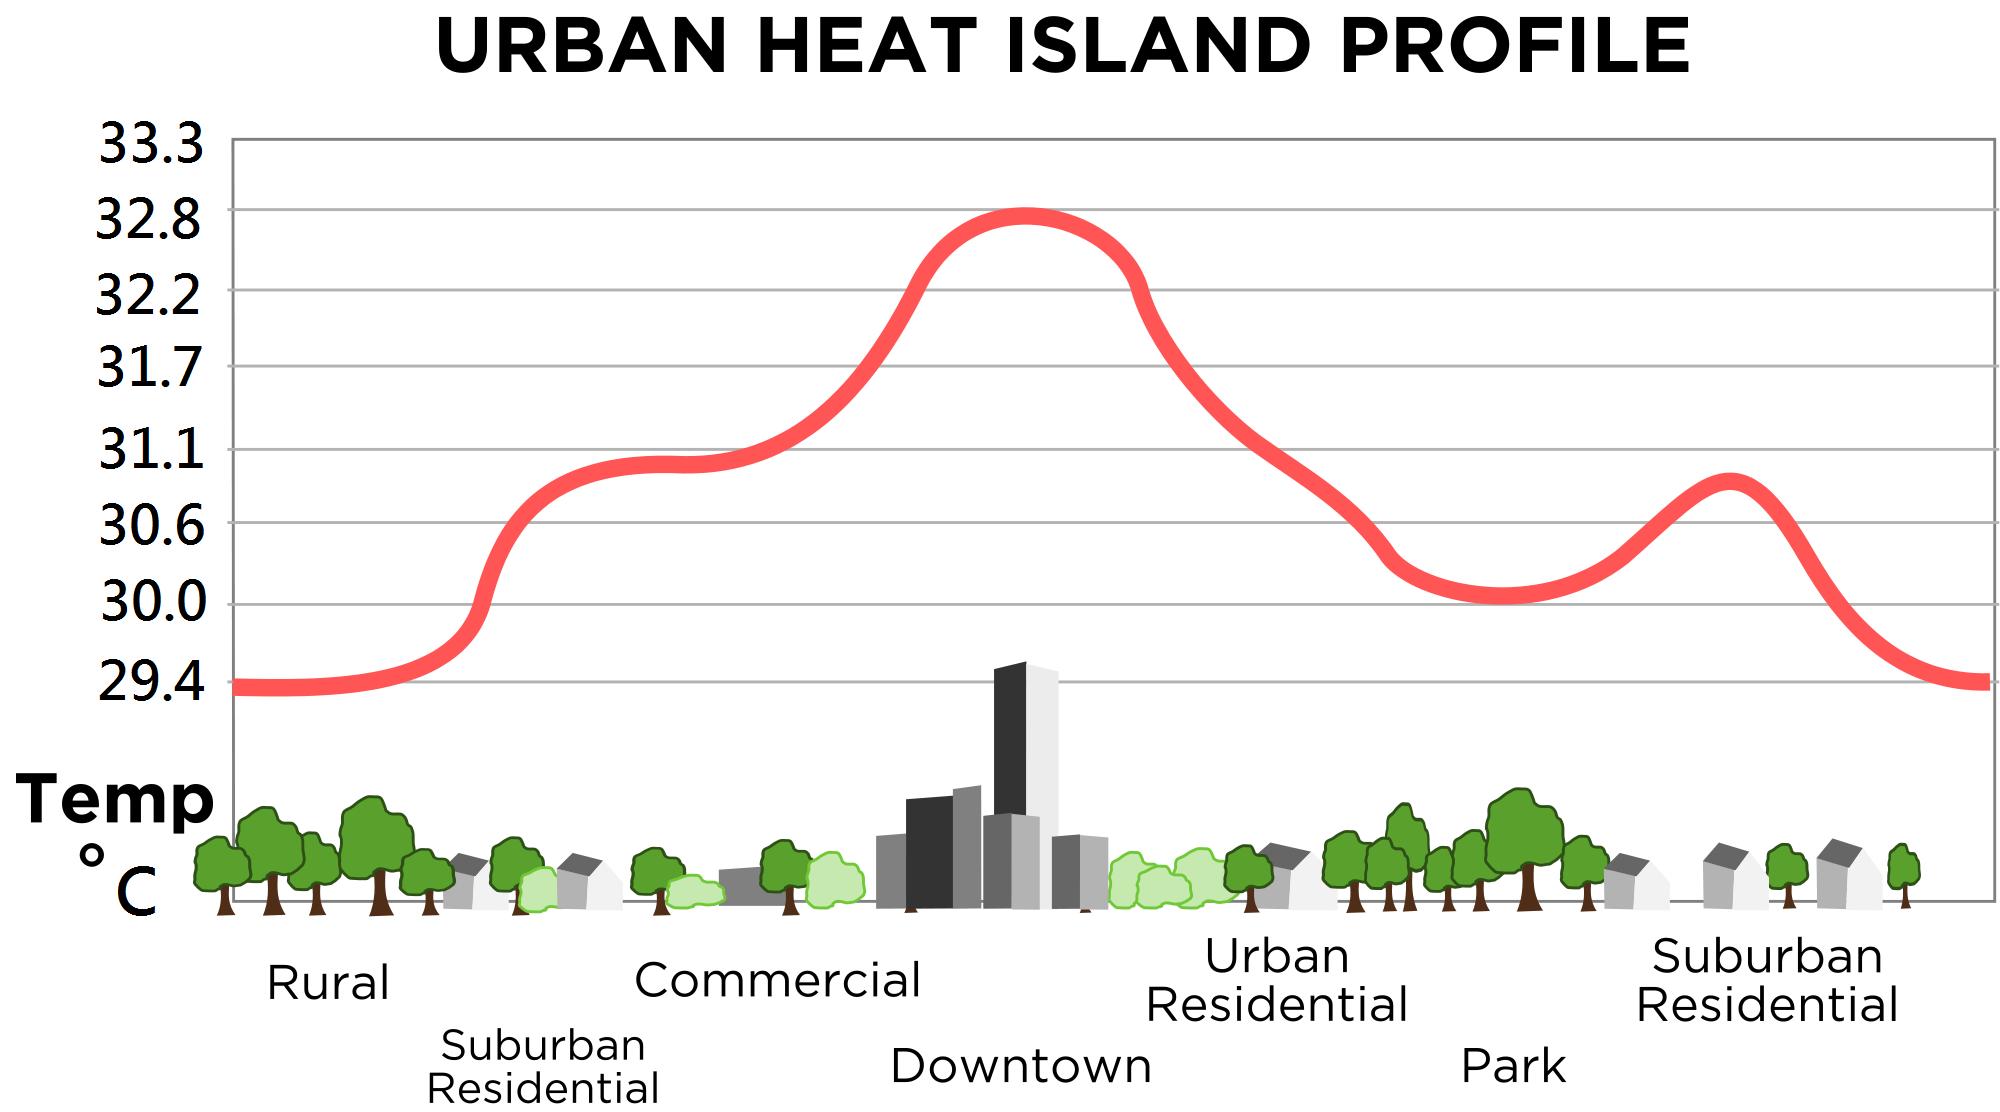 Urban_heat_island_(Celsius)